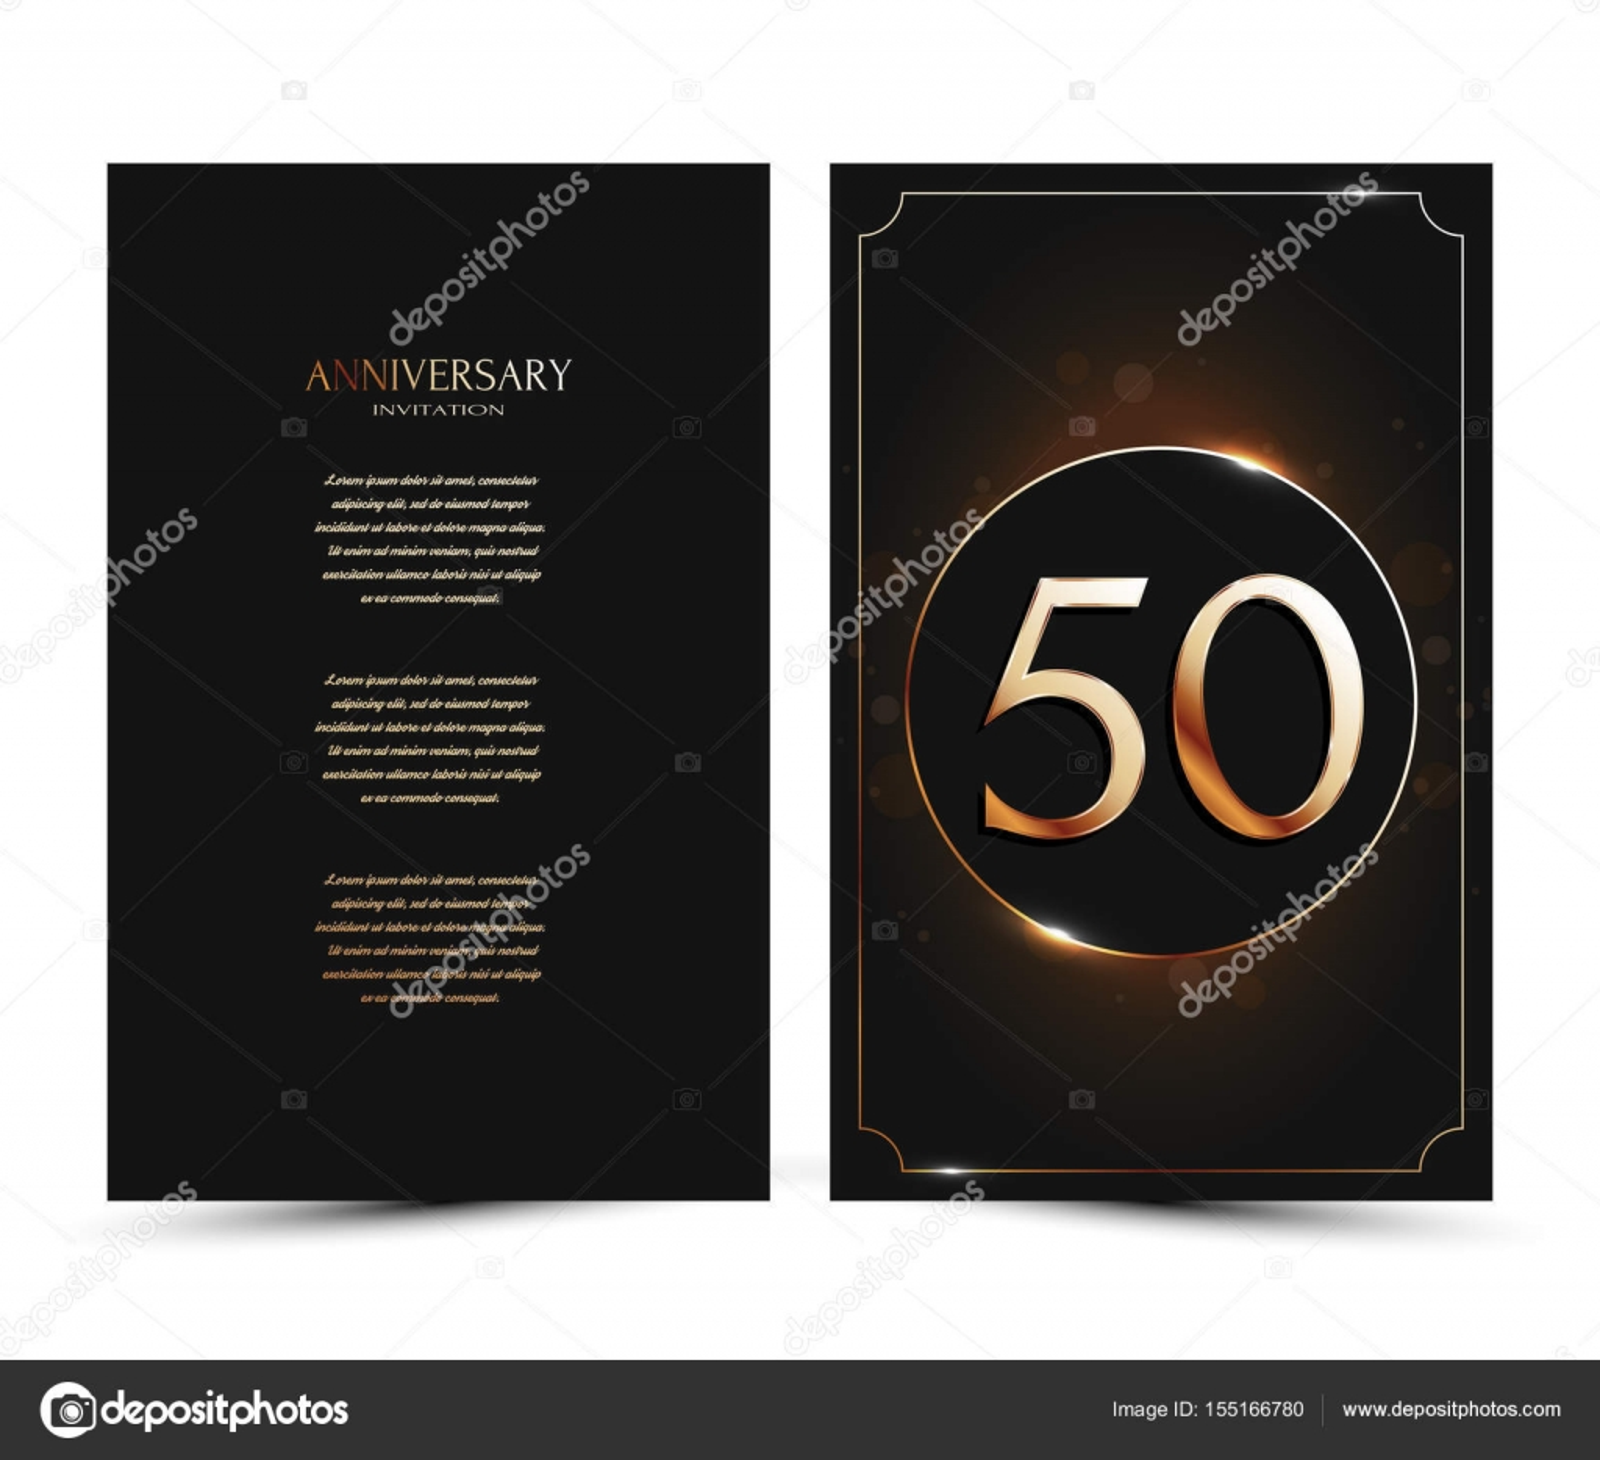 Populair 50 jaar verjaardag ingericht groet / uitnodiging kaart sjabloon @DP08